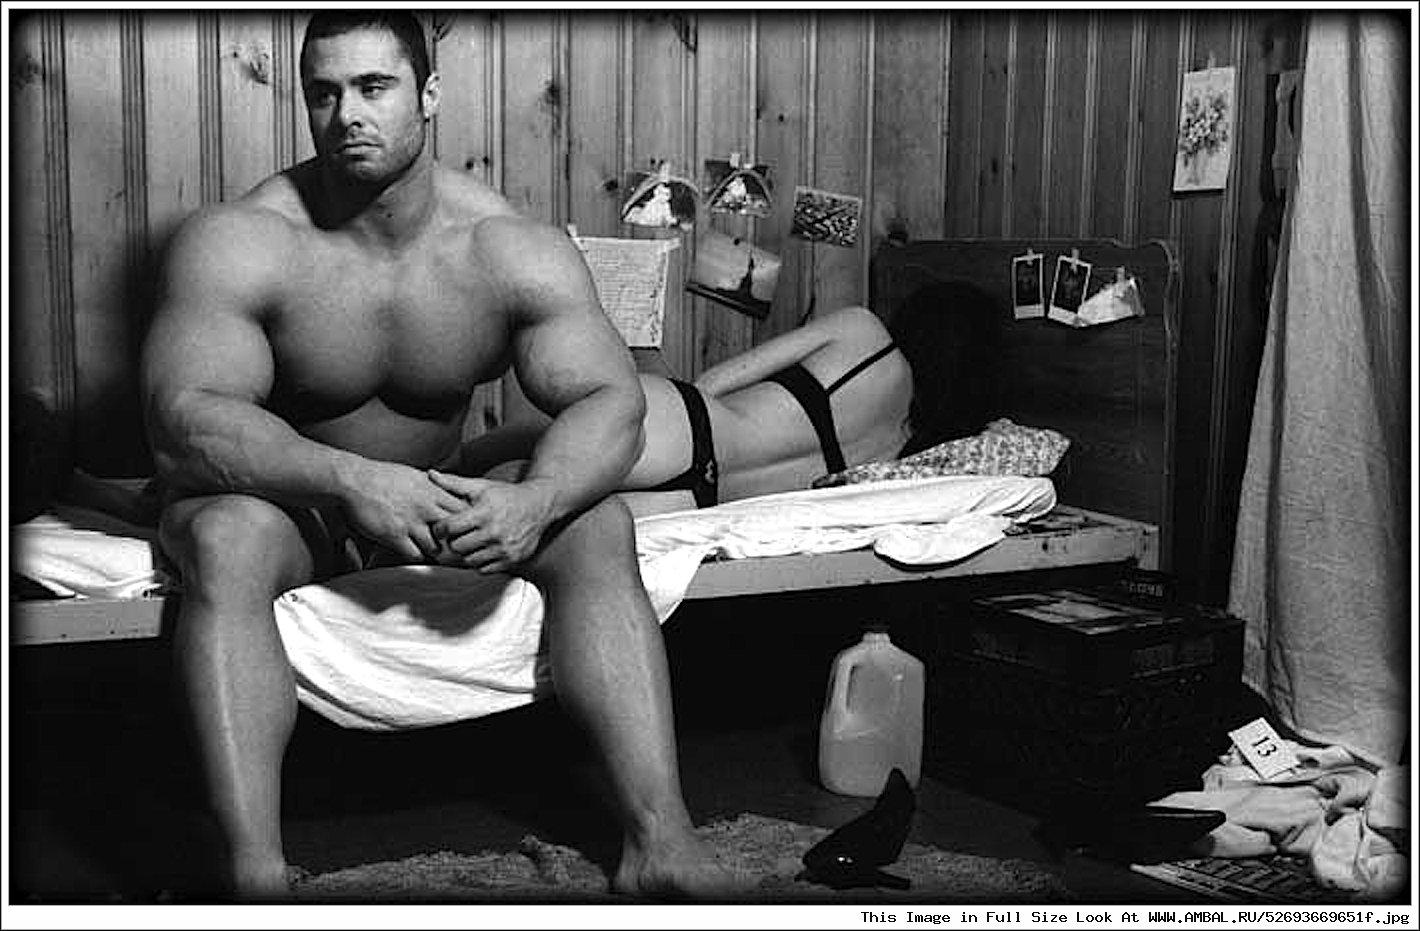 Влияет ли секс на рост мышц 11 фотография